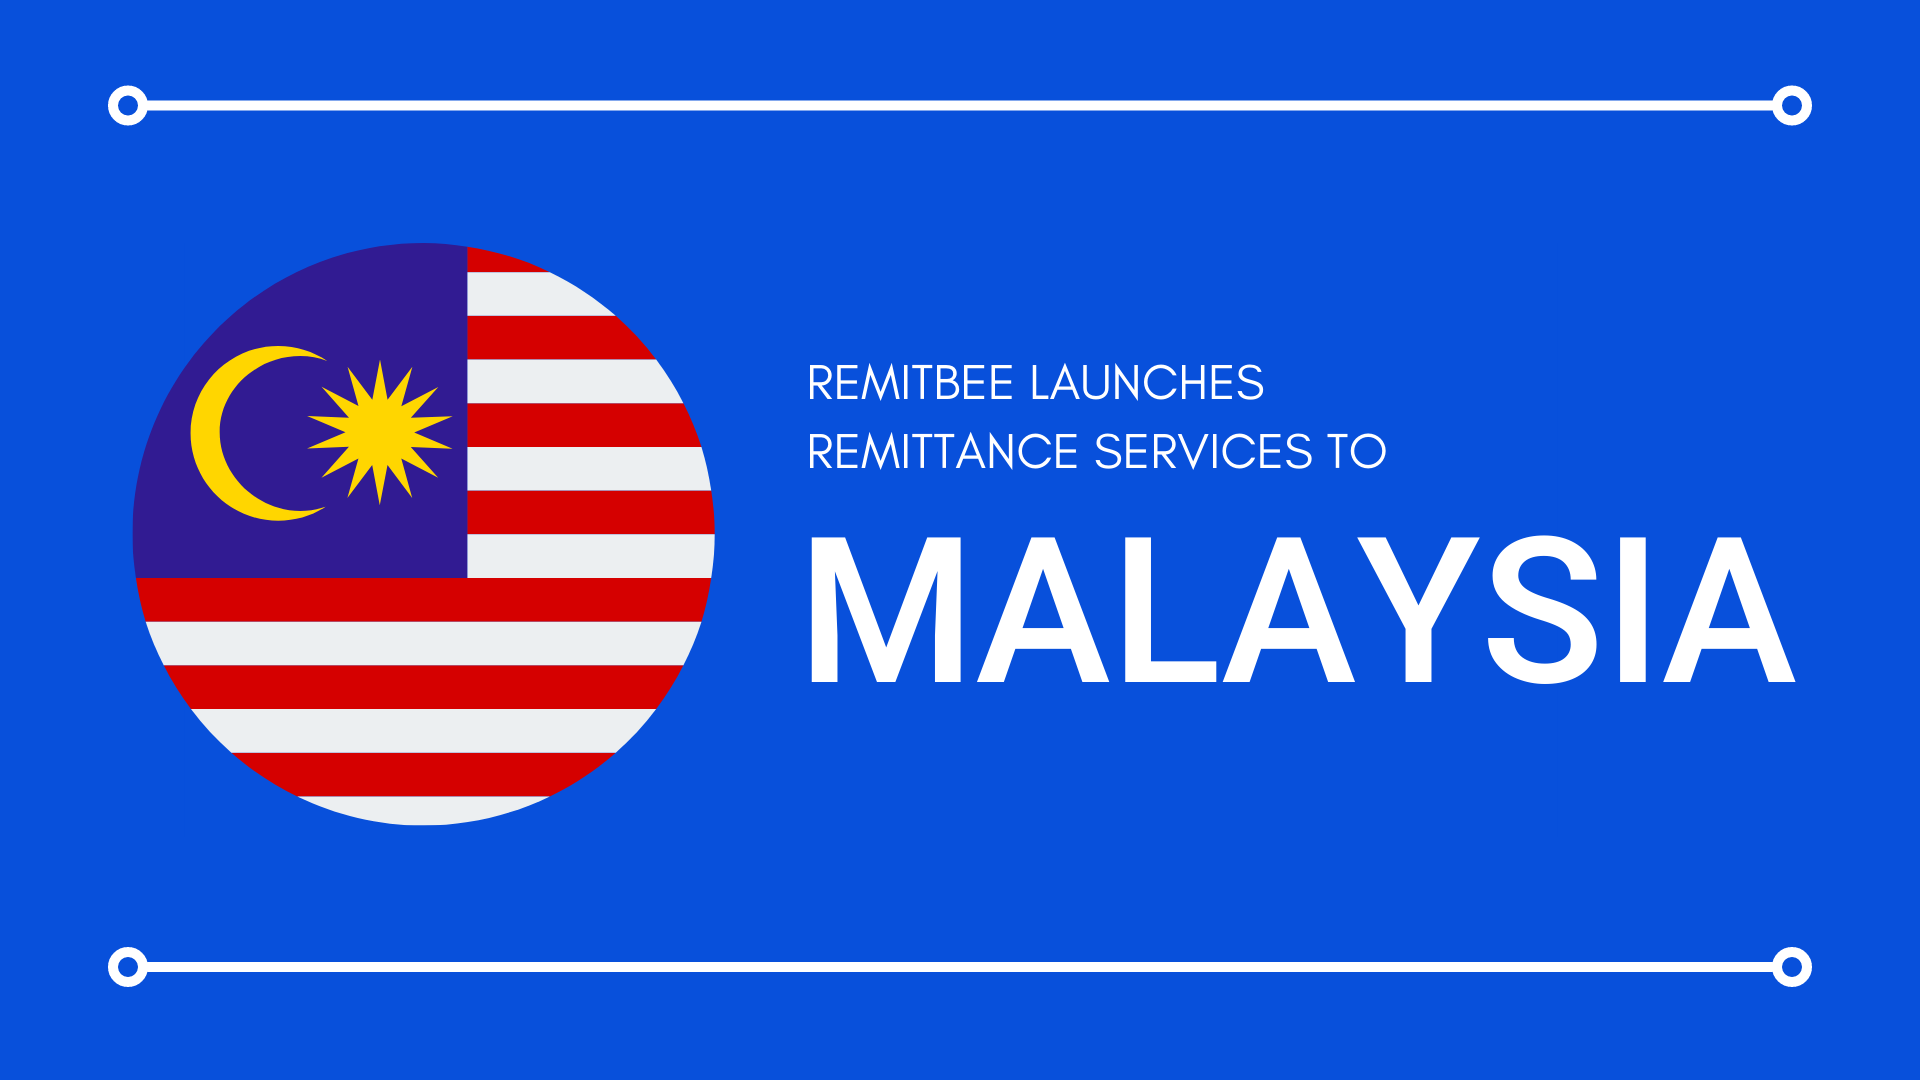 Malaysia Remittance facts